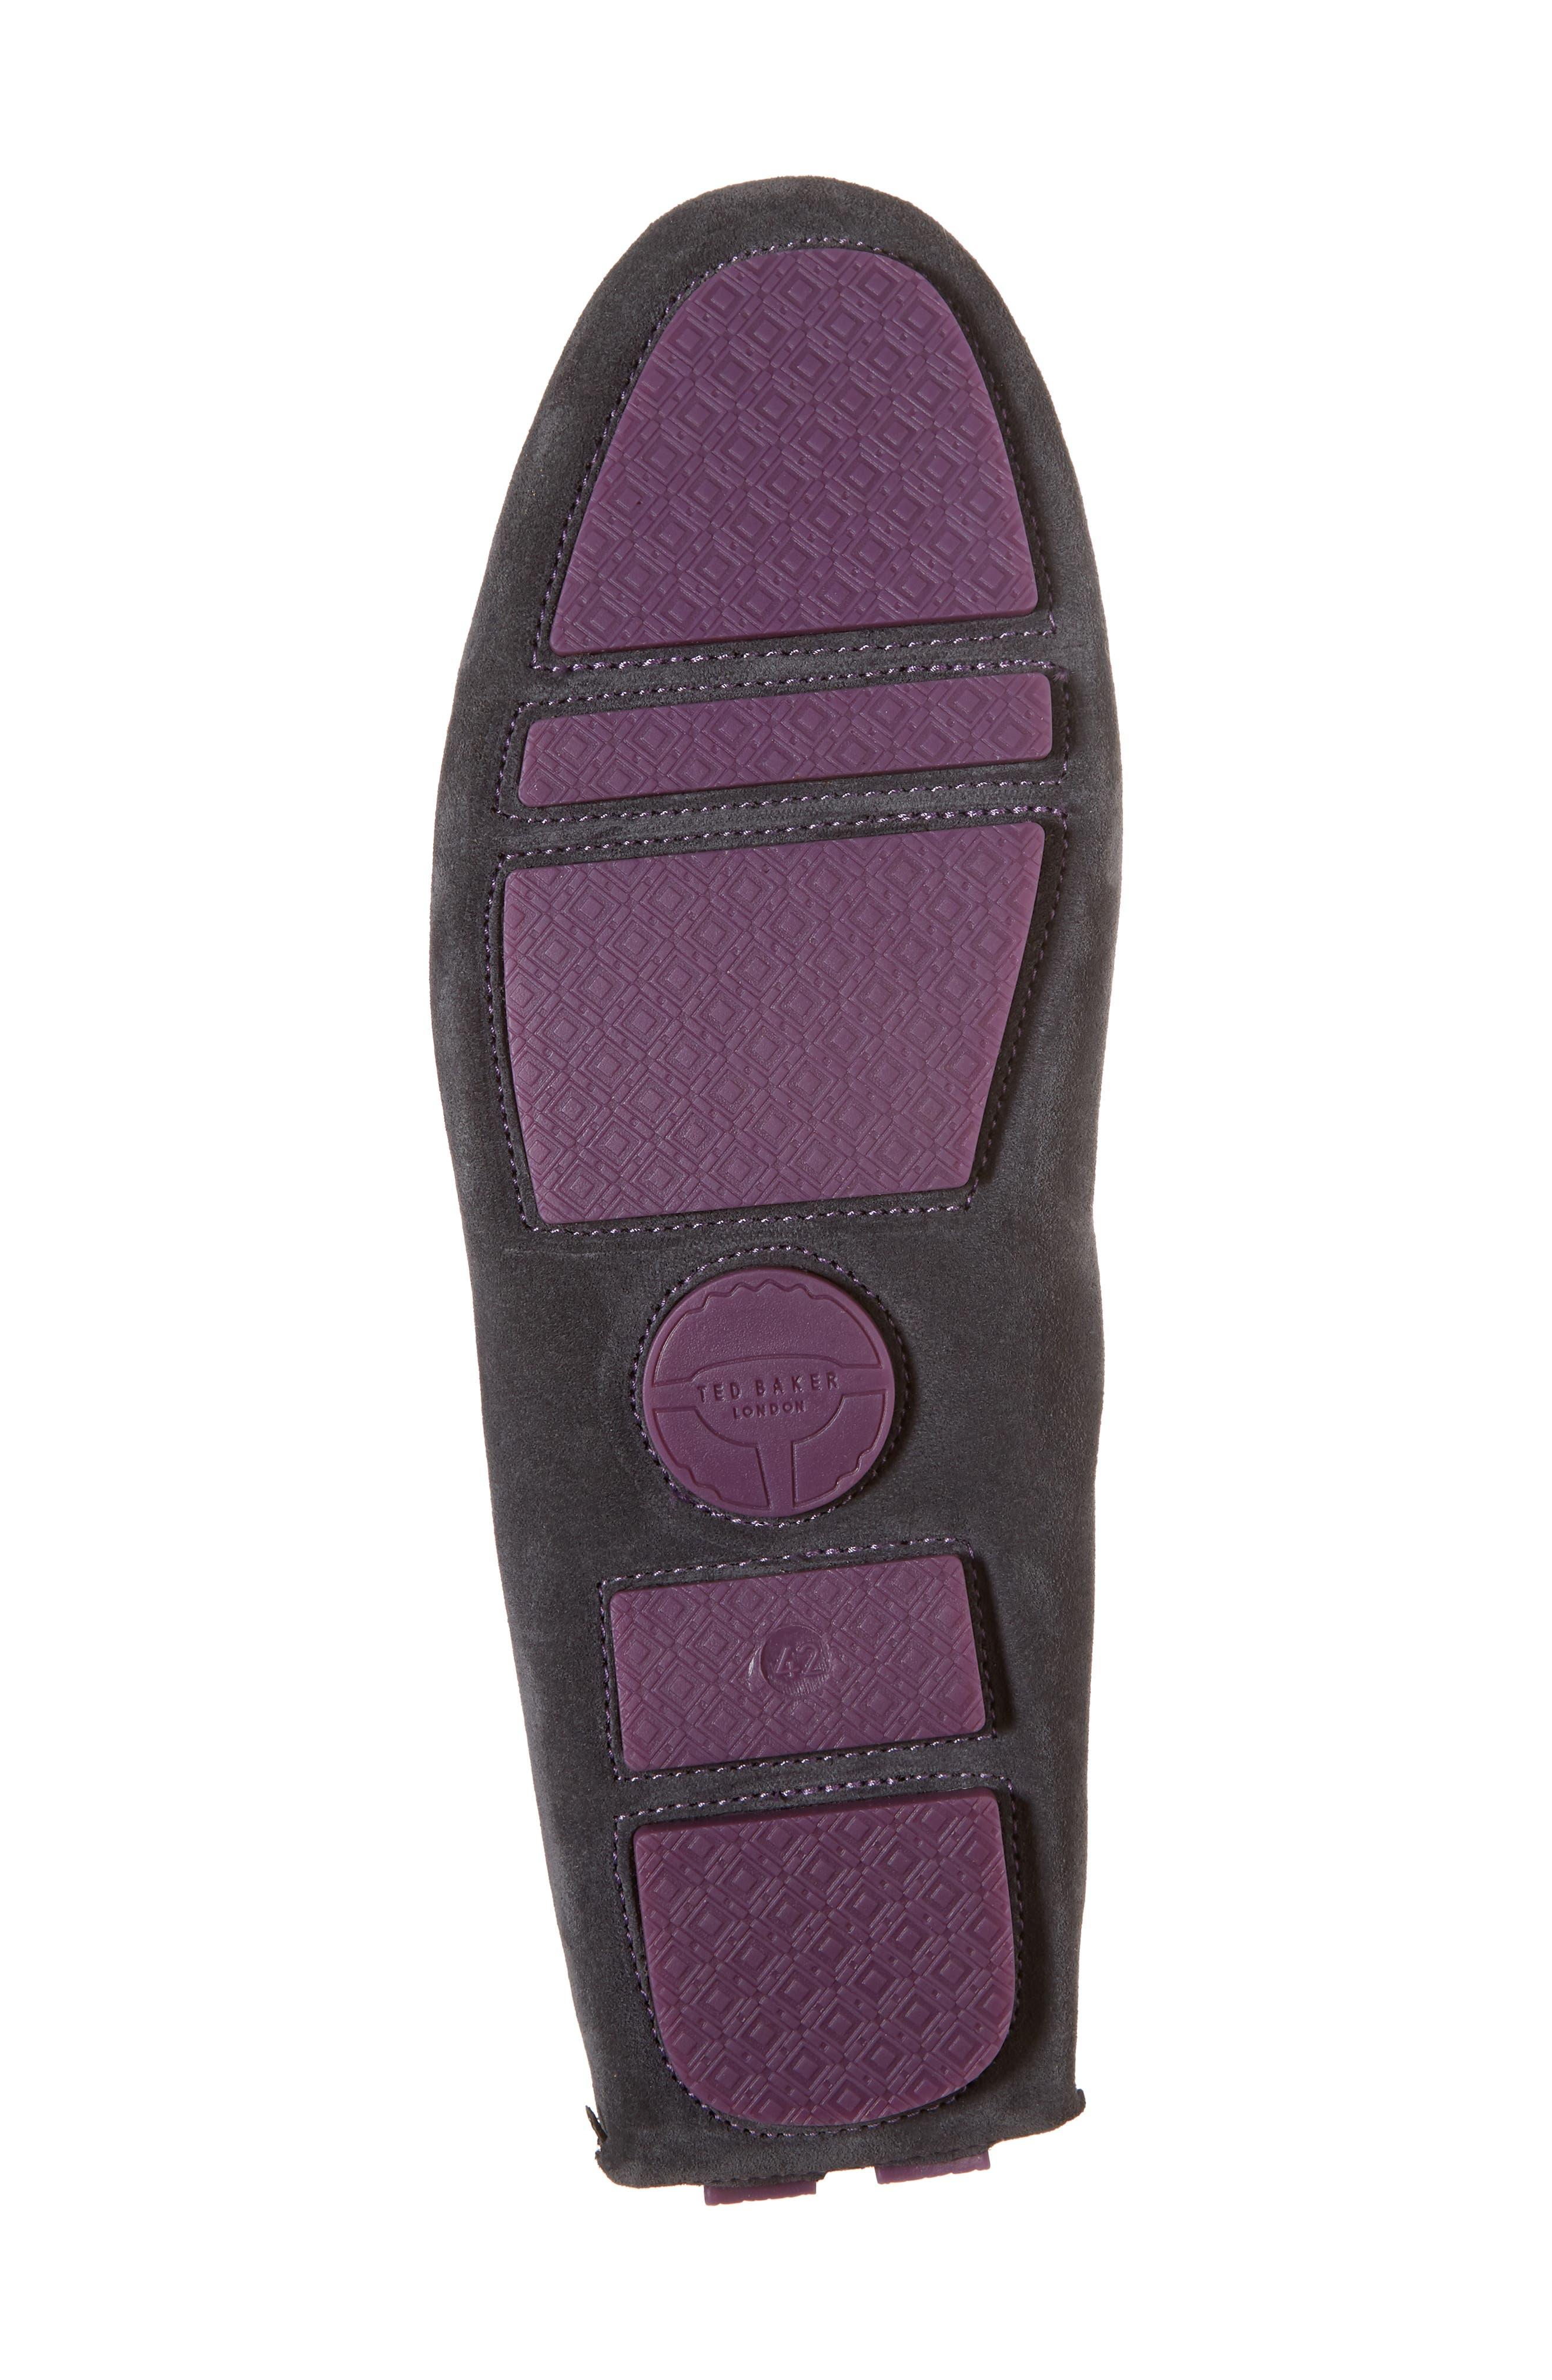 Urbonns Tasseled Driving Loafer,                             Alternate thumbnail 6, color,                             070